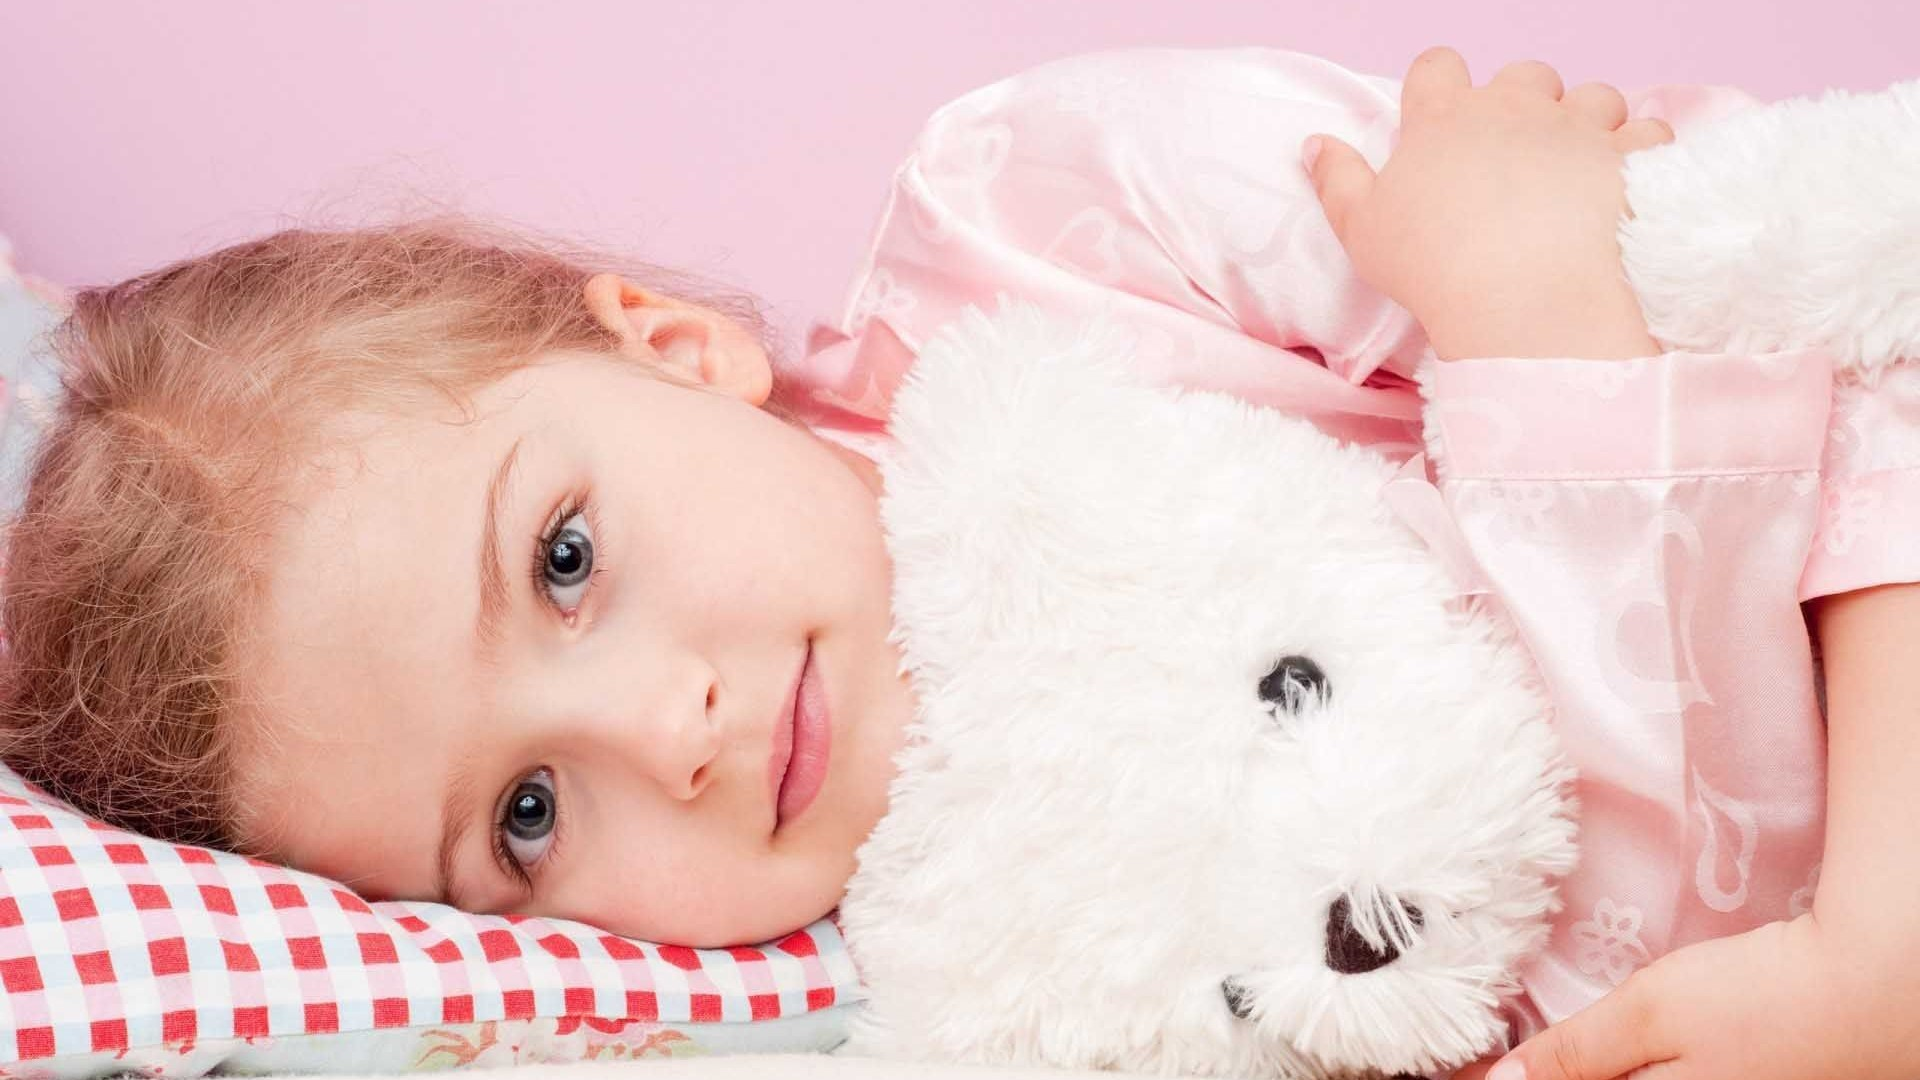 Cute Teddy Bear Wallpaper With Image Resolution Pixel - Little Girl With Teddy Bear Wallpaperup - HD Wallpaper